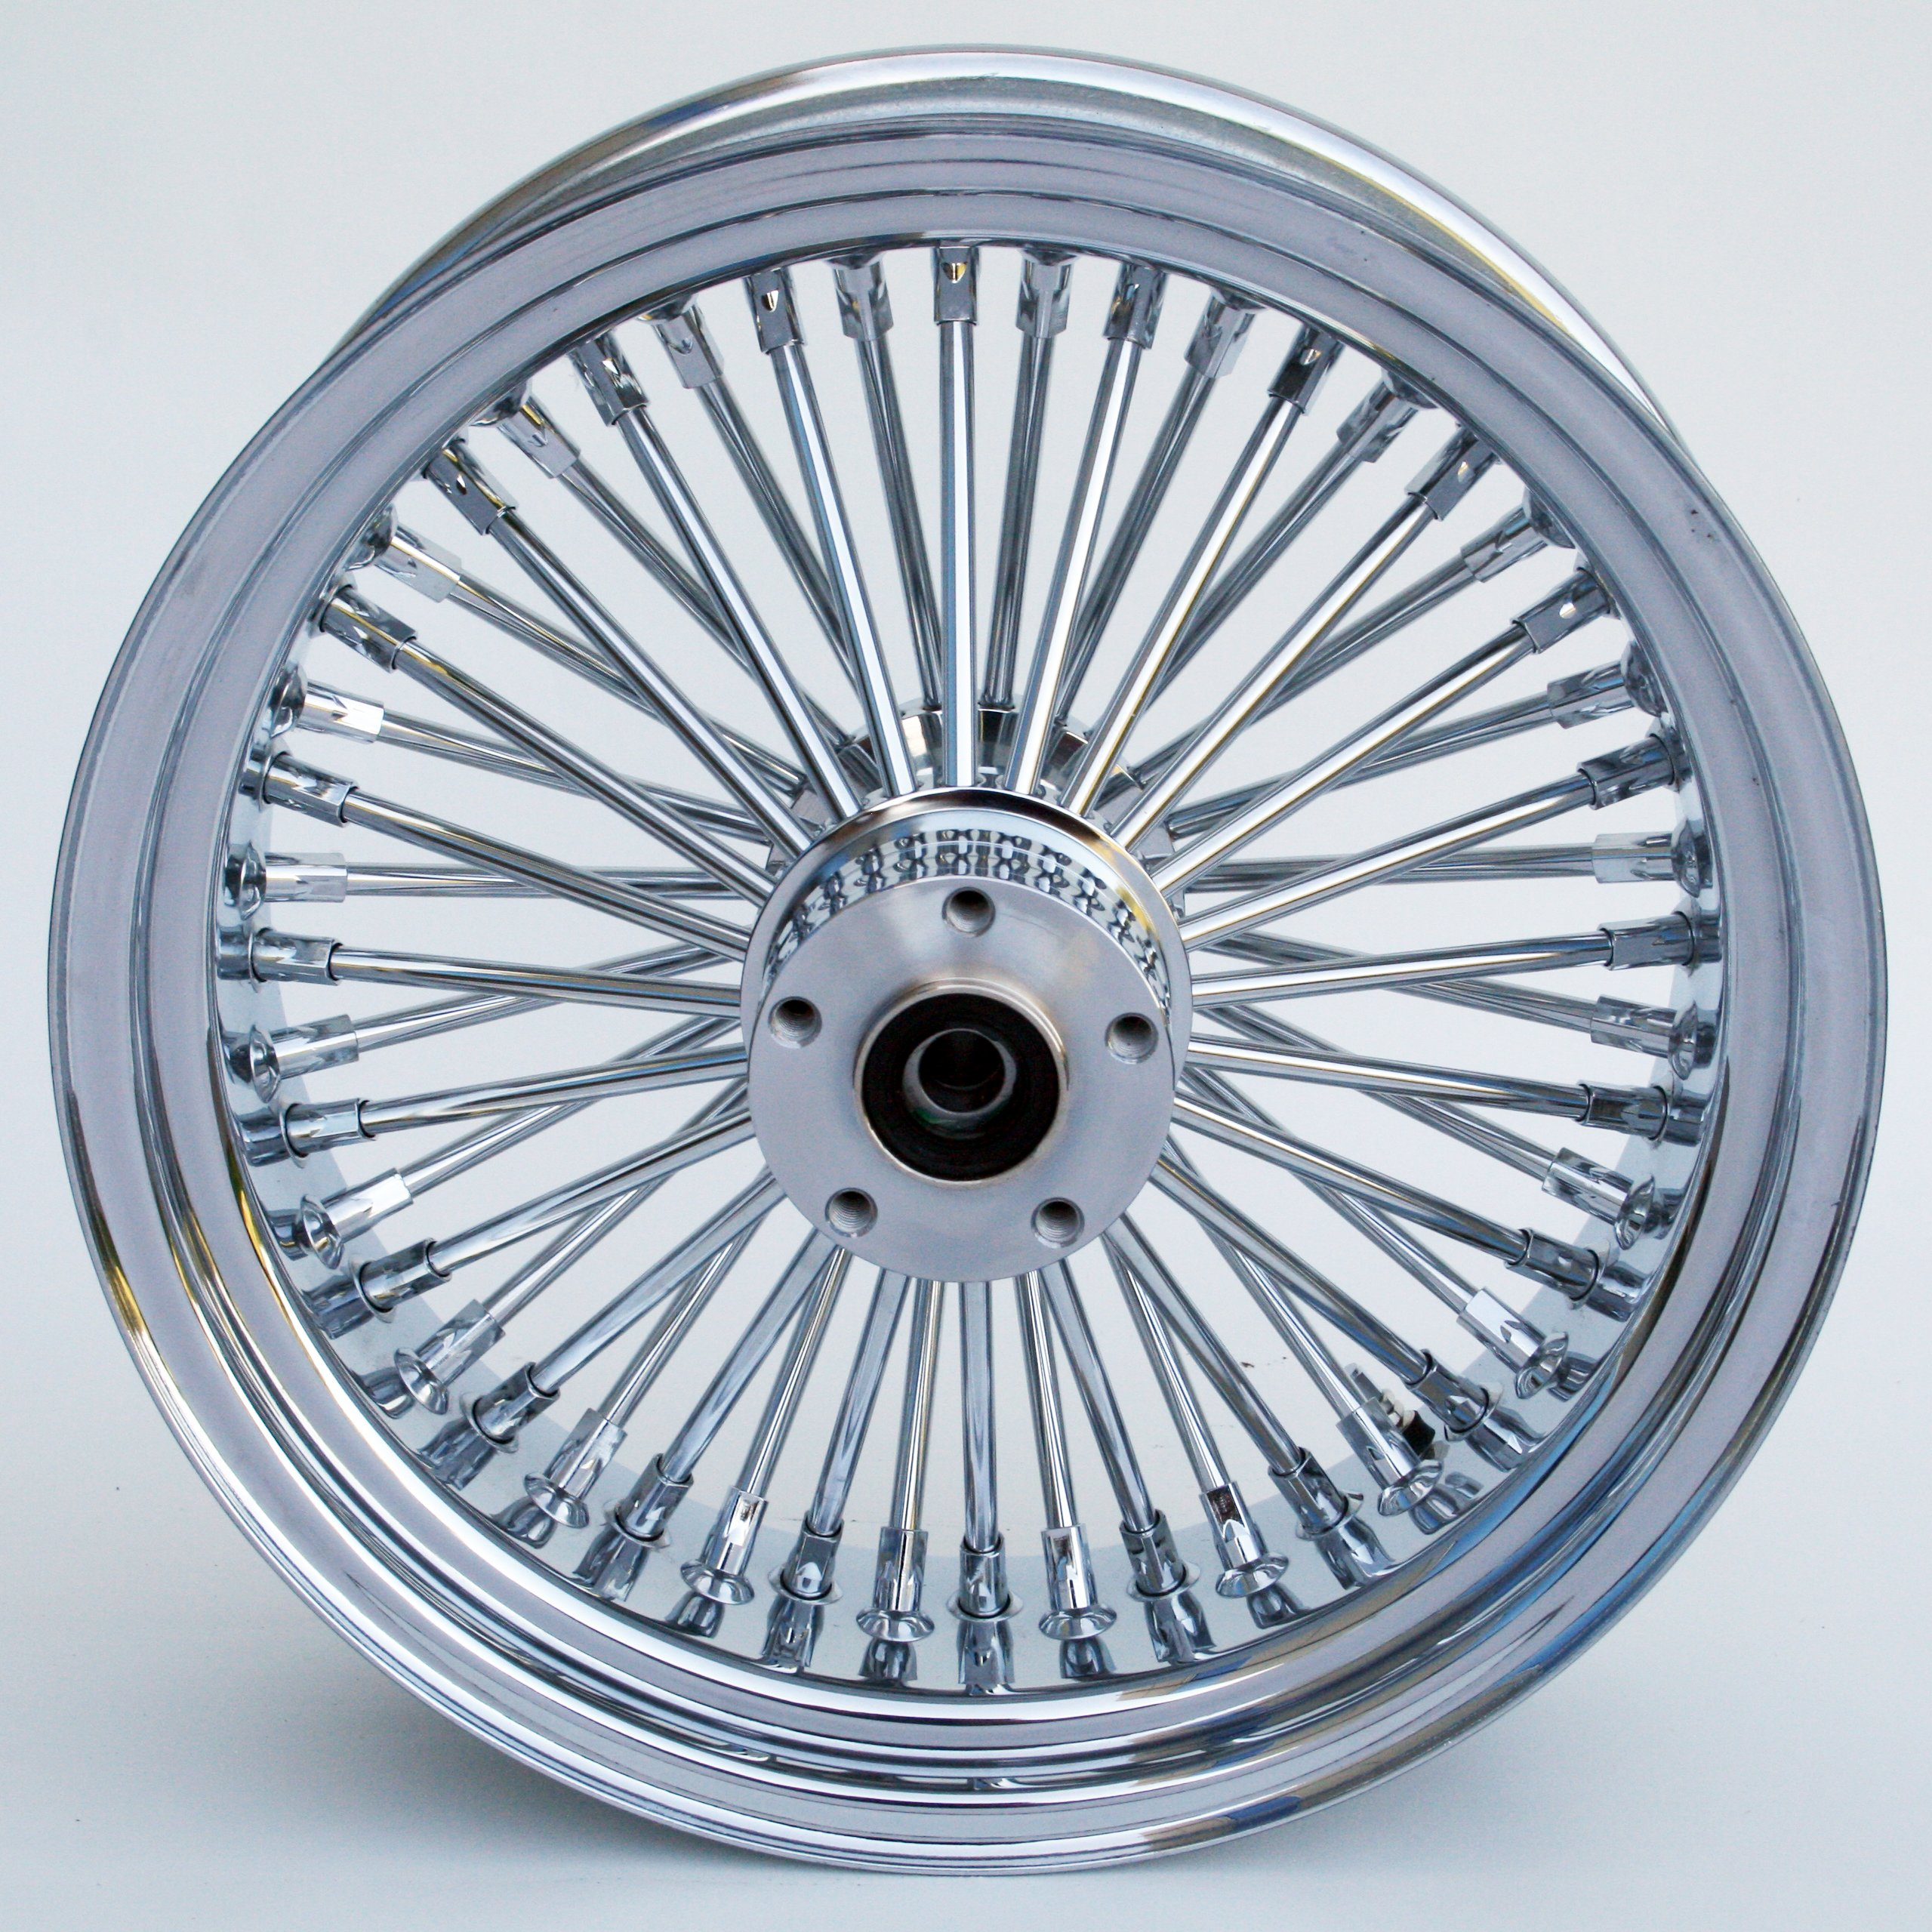 Ultima King Spoke Chrome Front Single Disc Wheel 16x3.5 for 2000-06 Harley Models (37-527)